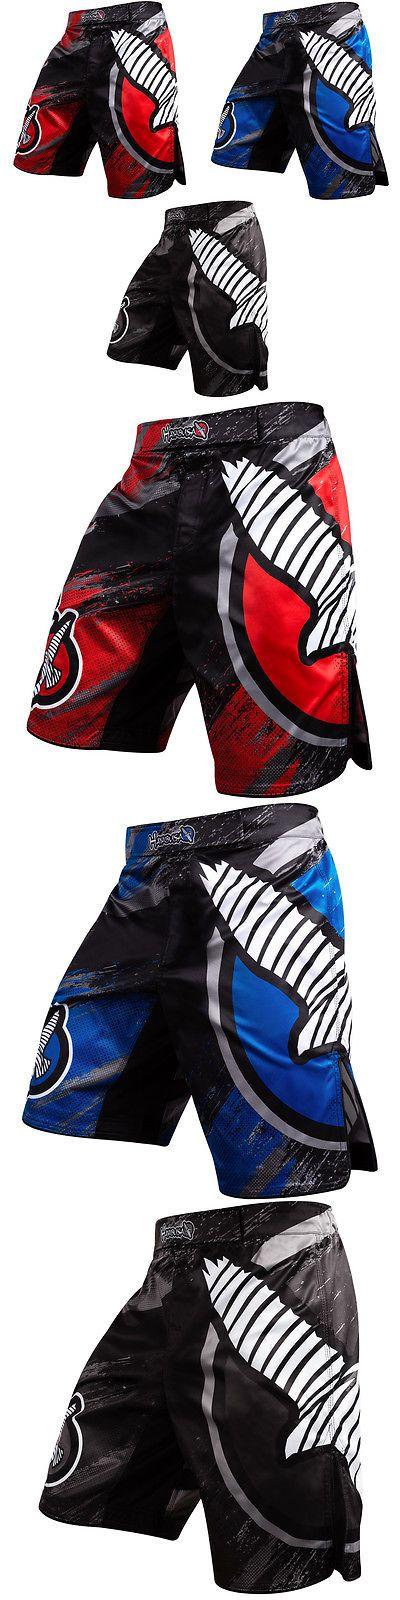 Shorts 73982: Hayabusa Chikara 3 Guardlock2 Mma Fight Shorts -> BUY IT NOW ONLY: $69.99 on eBay!